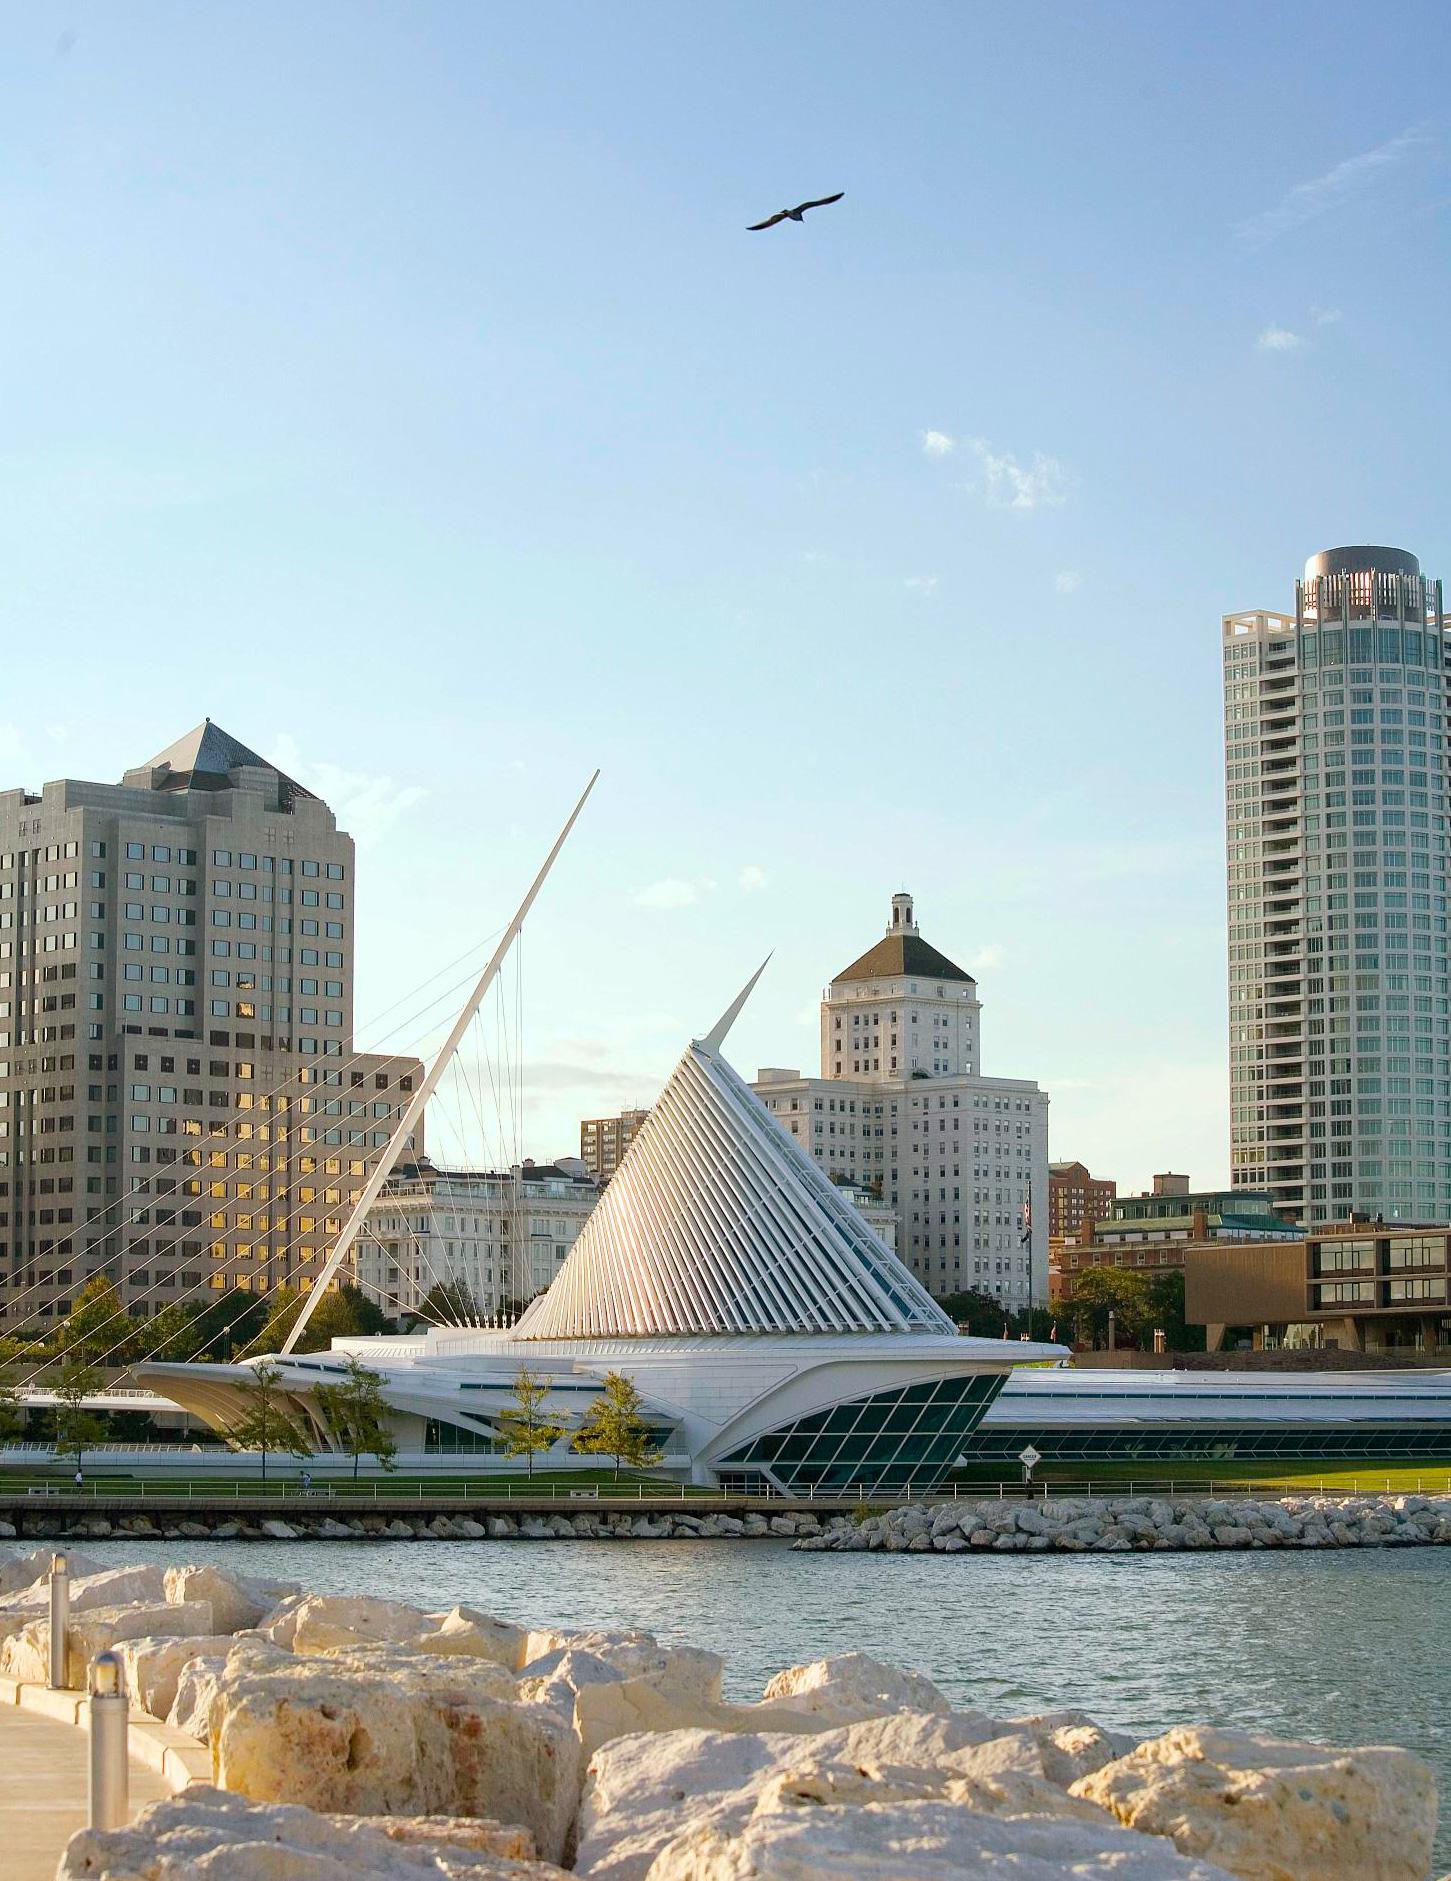 Milwaukee: 93 miles north of Chicago